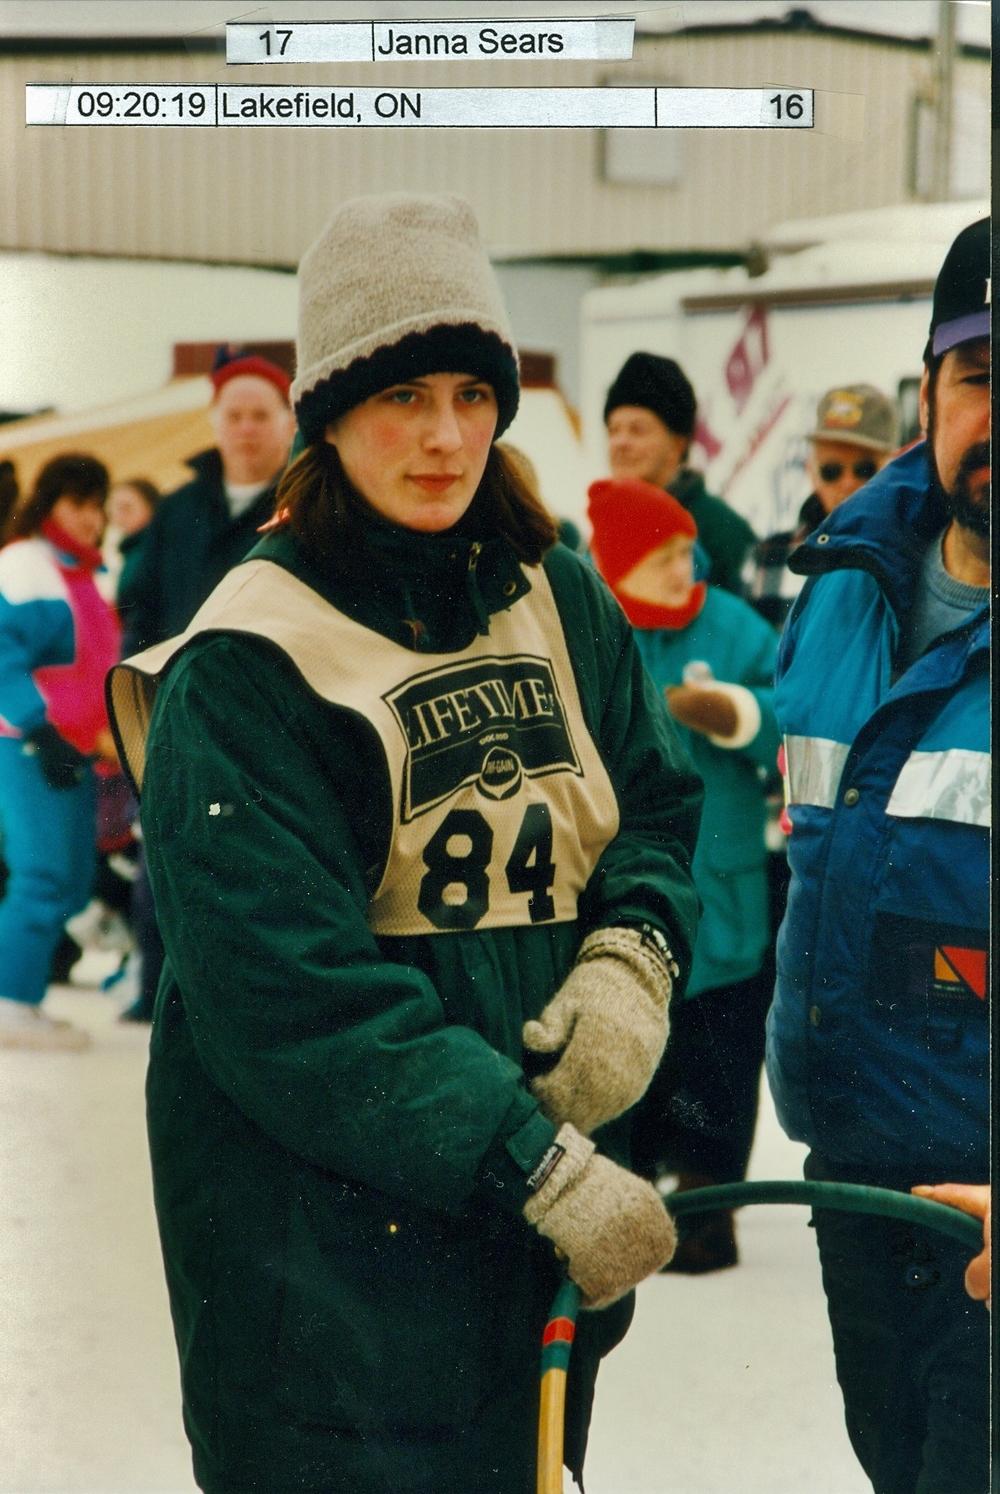 Snofest 1997 Janna Sears, Lakefield